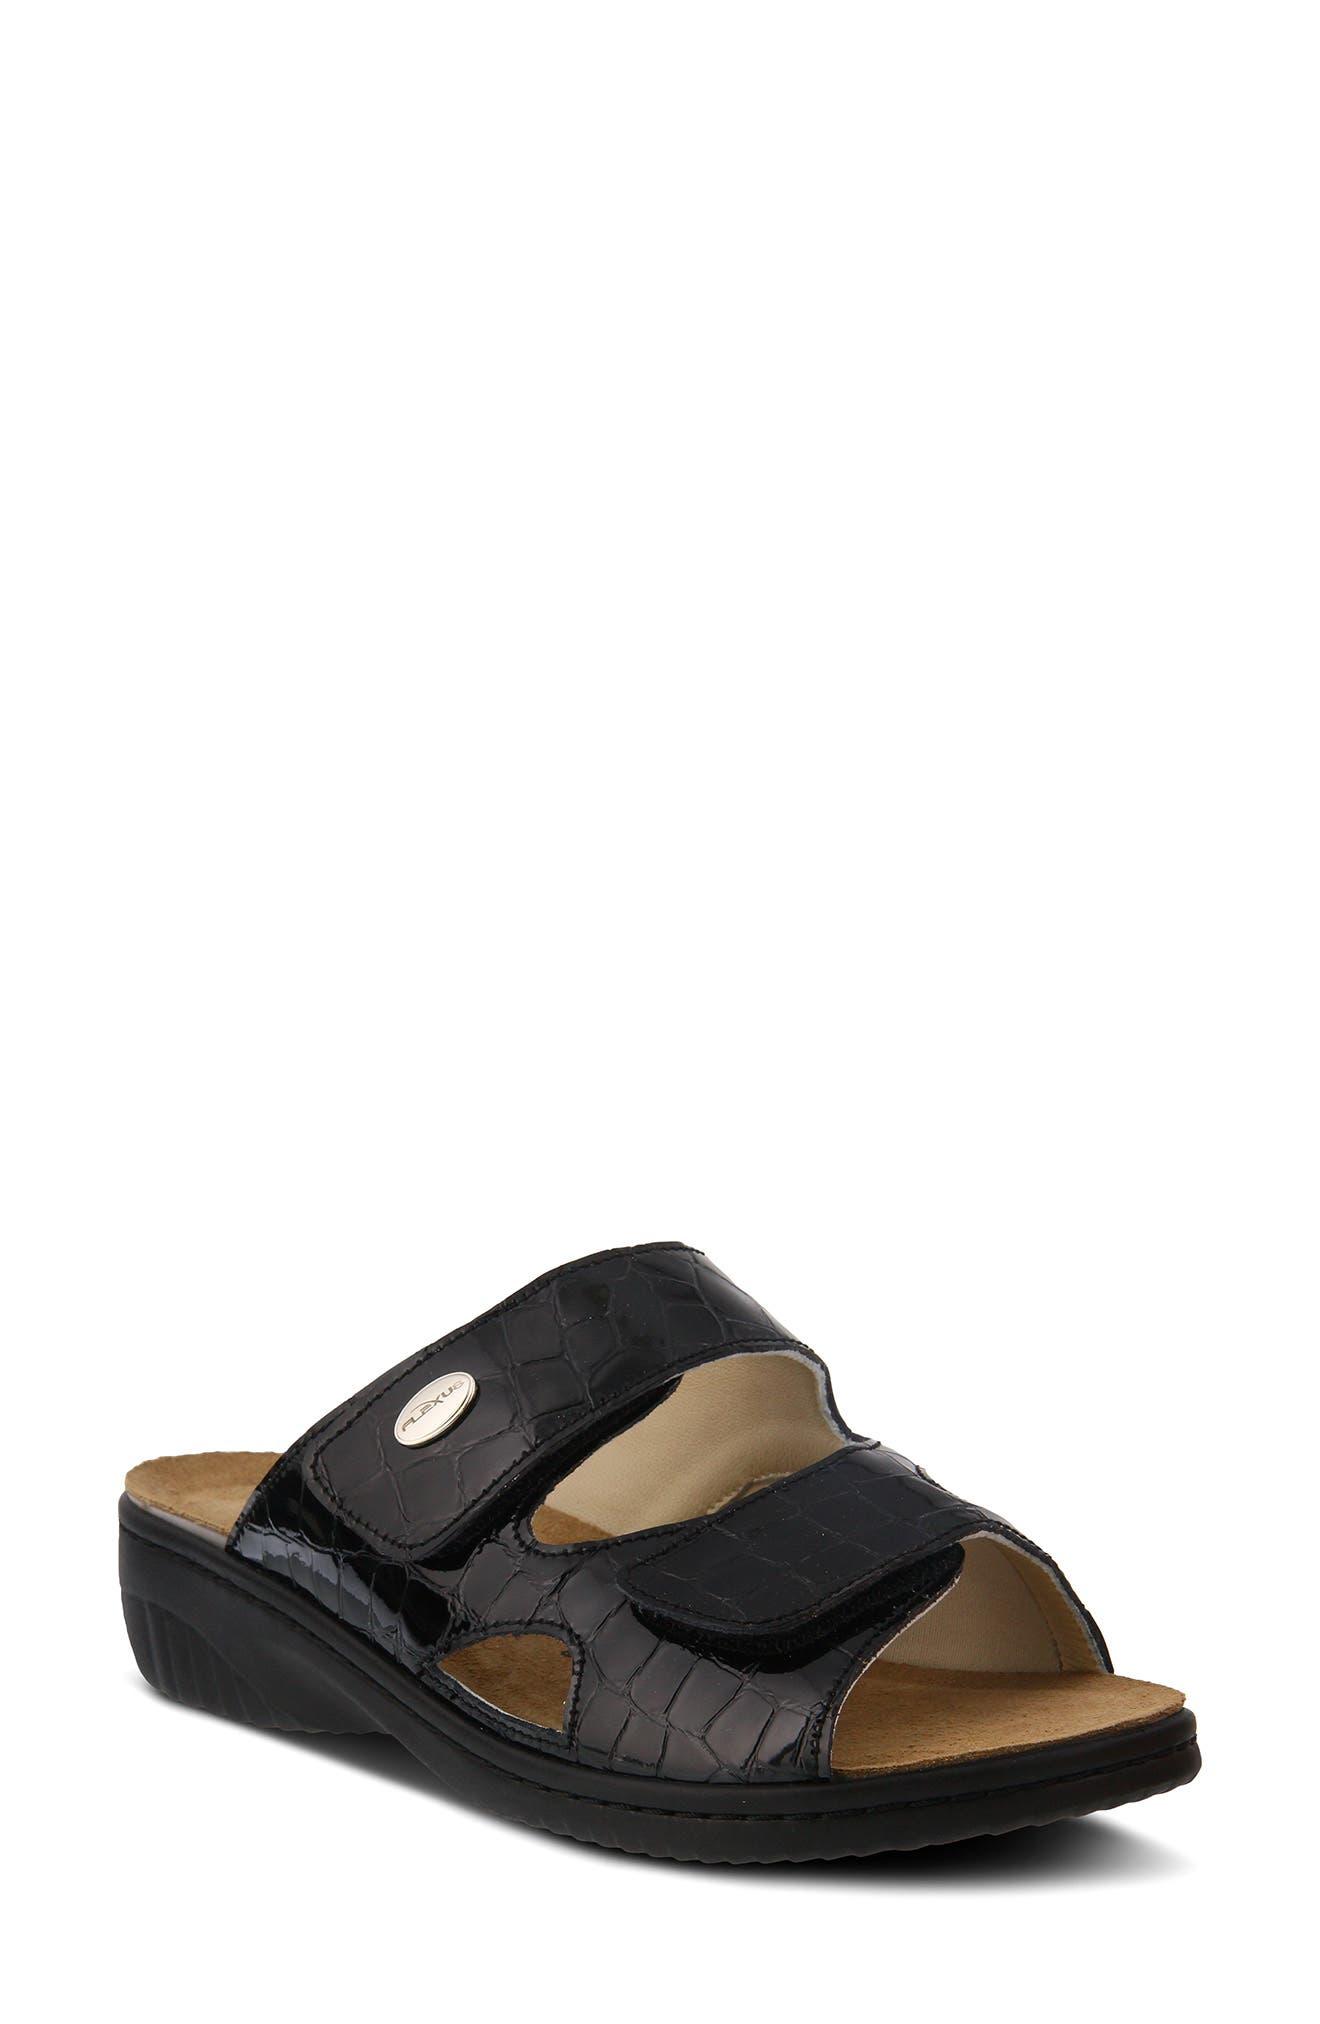 Almeria Slide Sandal